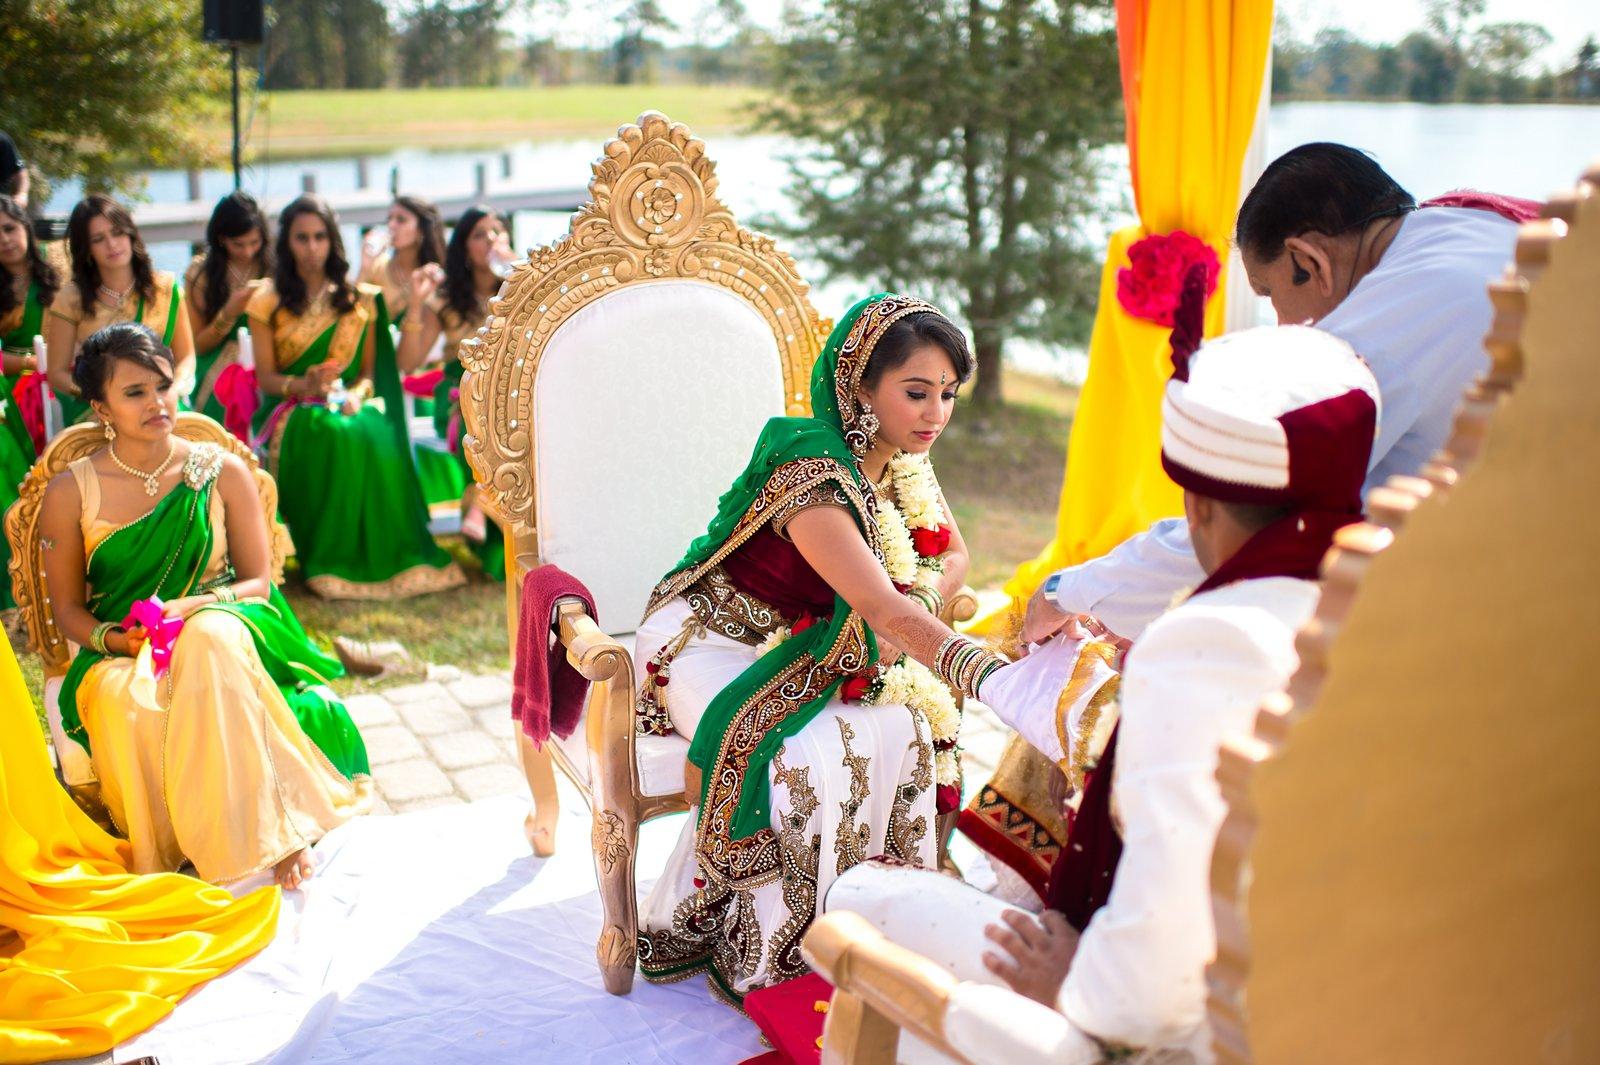 Devi + Ankit, Sneak Peek   Champagne Manor   Monroe, NC, Miami Wedding Photographers   Häring Photography, Indian Wedding Photographer in Florida, Best Muslim, Hindu - South East Asian Wedding Photographers